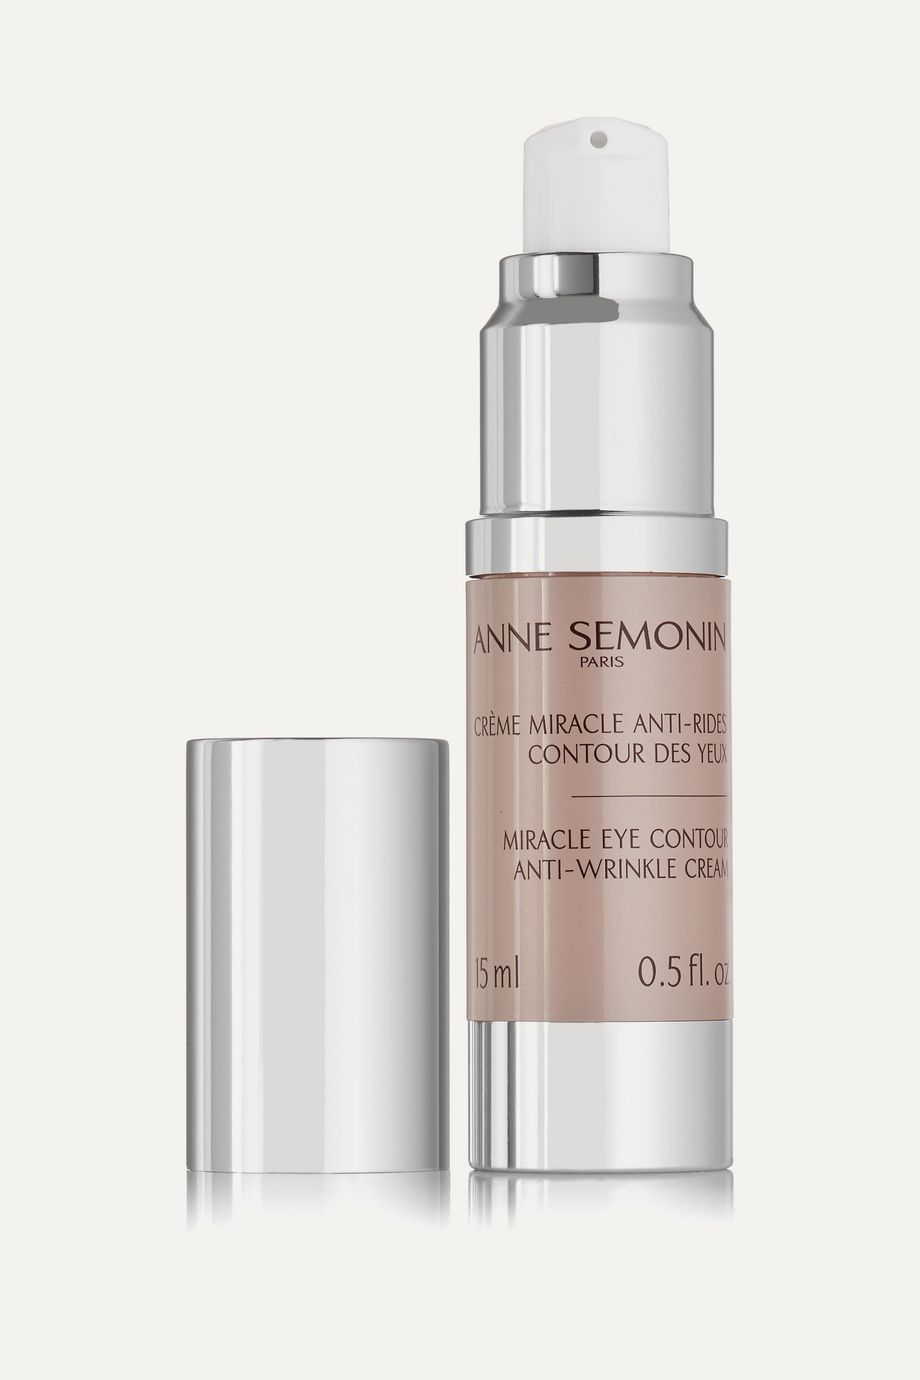 Anne Semonin Miracle Eye Contour Anti-Wrinkle Cream, 15ml